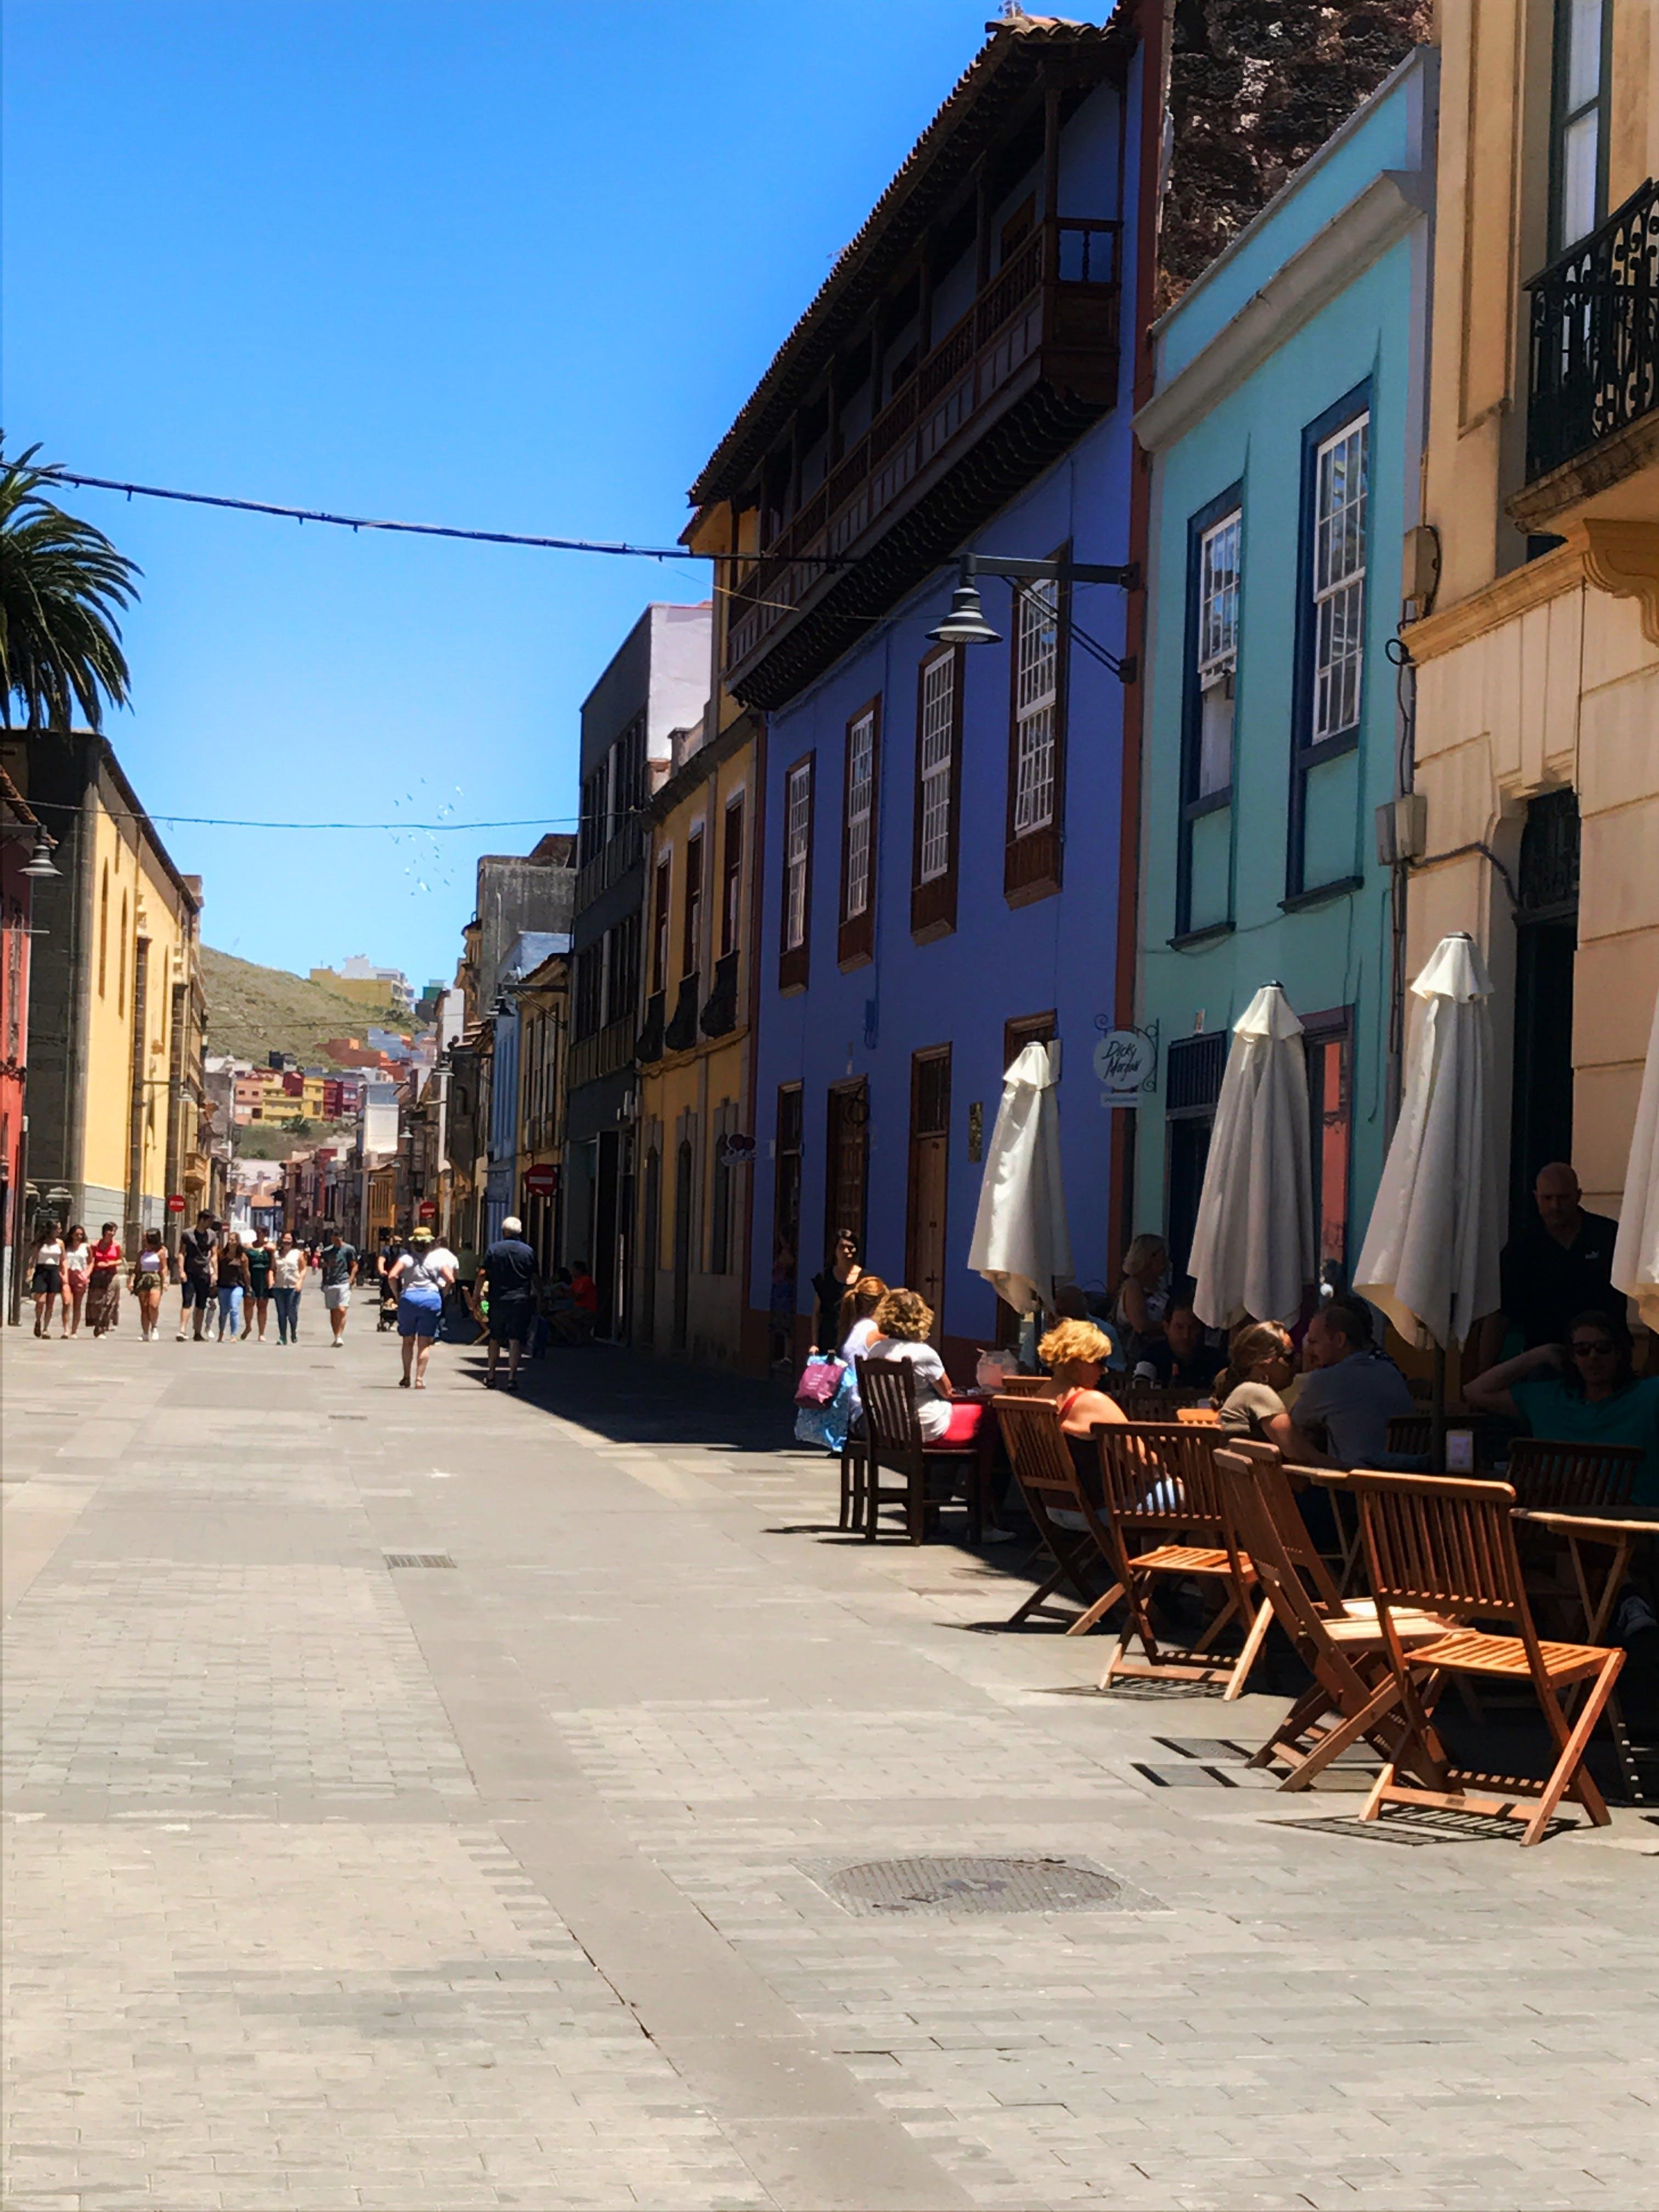 Free stock photo of La Laguna Canarias